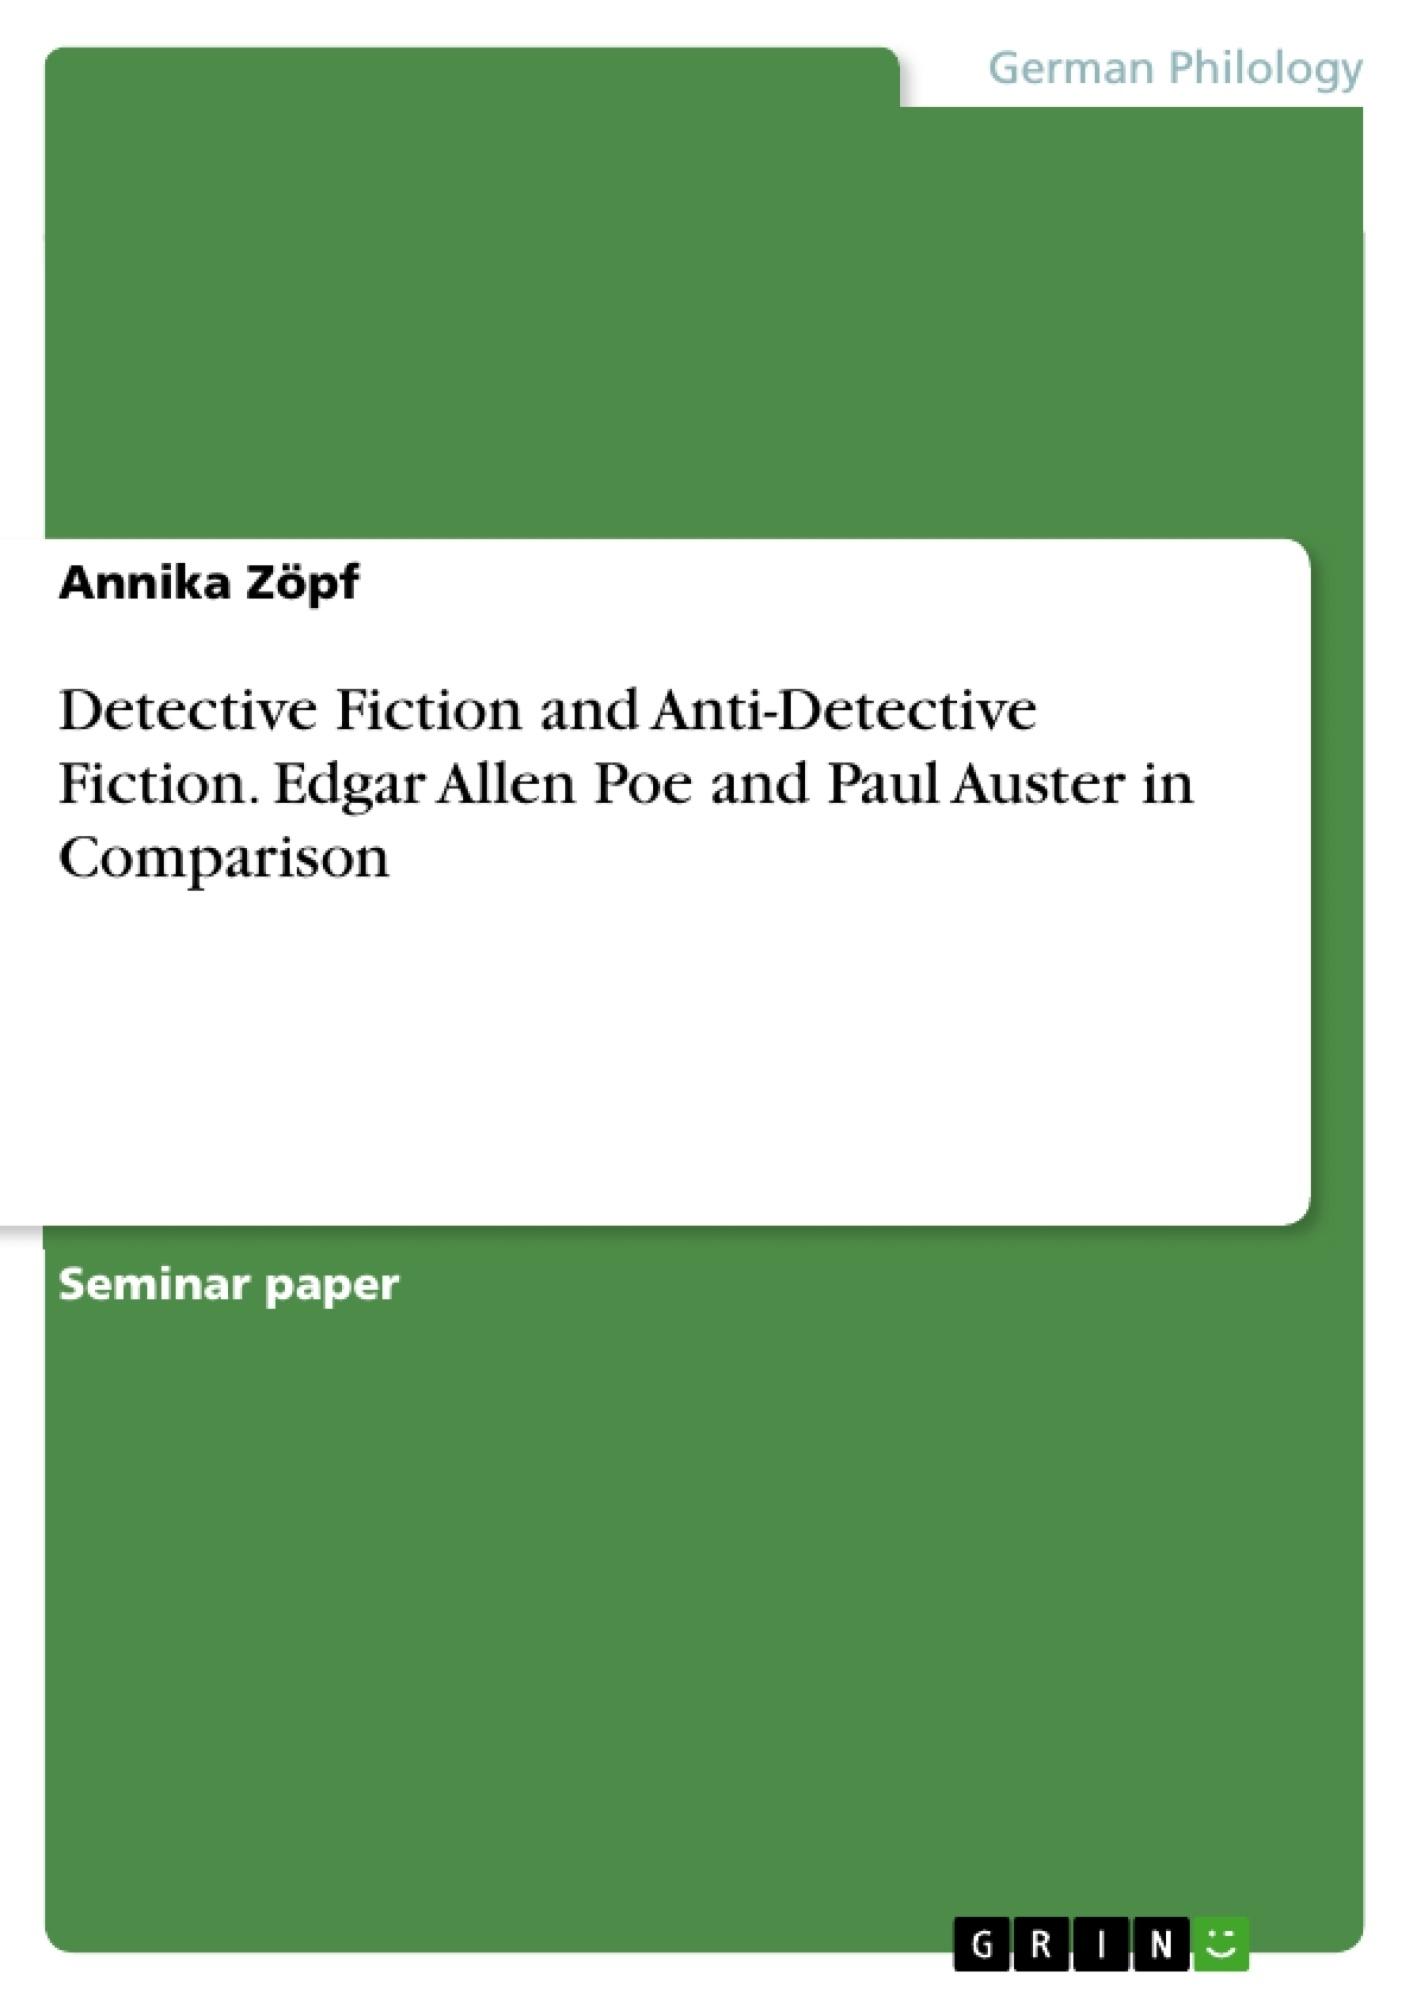 Title: Detective Fiction and Anti-Detective Fiction. Edgar Allen Poe and Paul Auster in Comparison